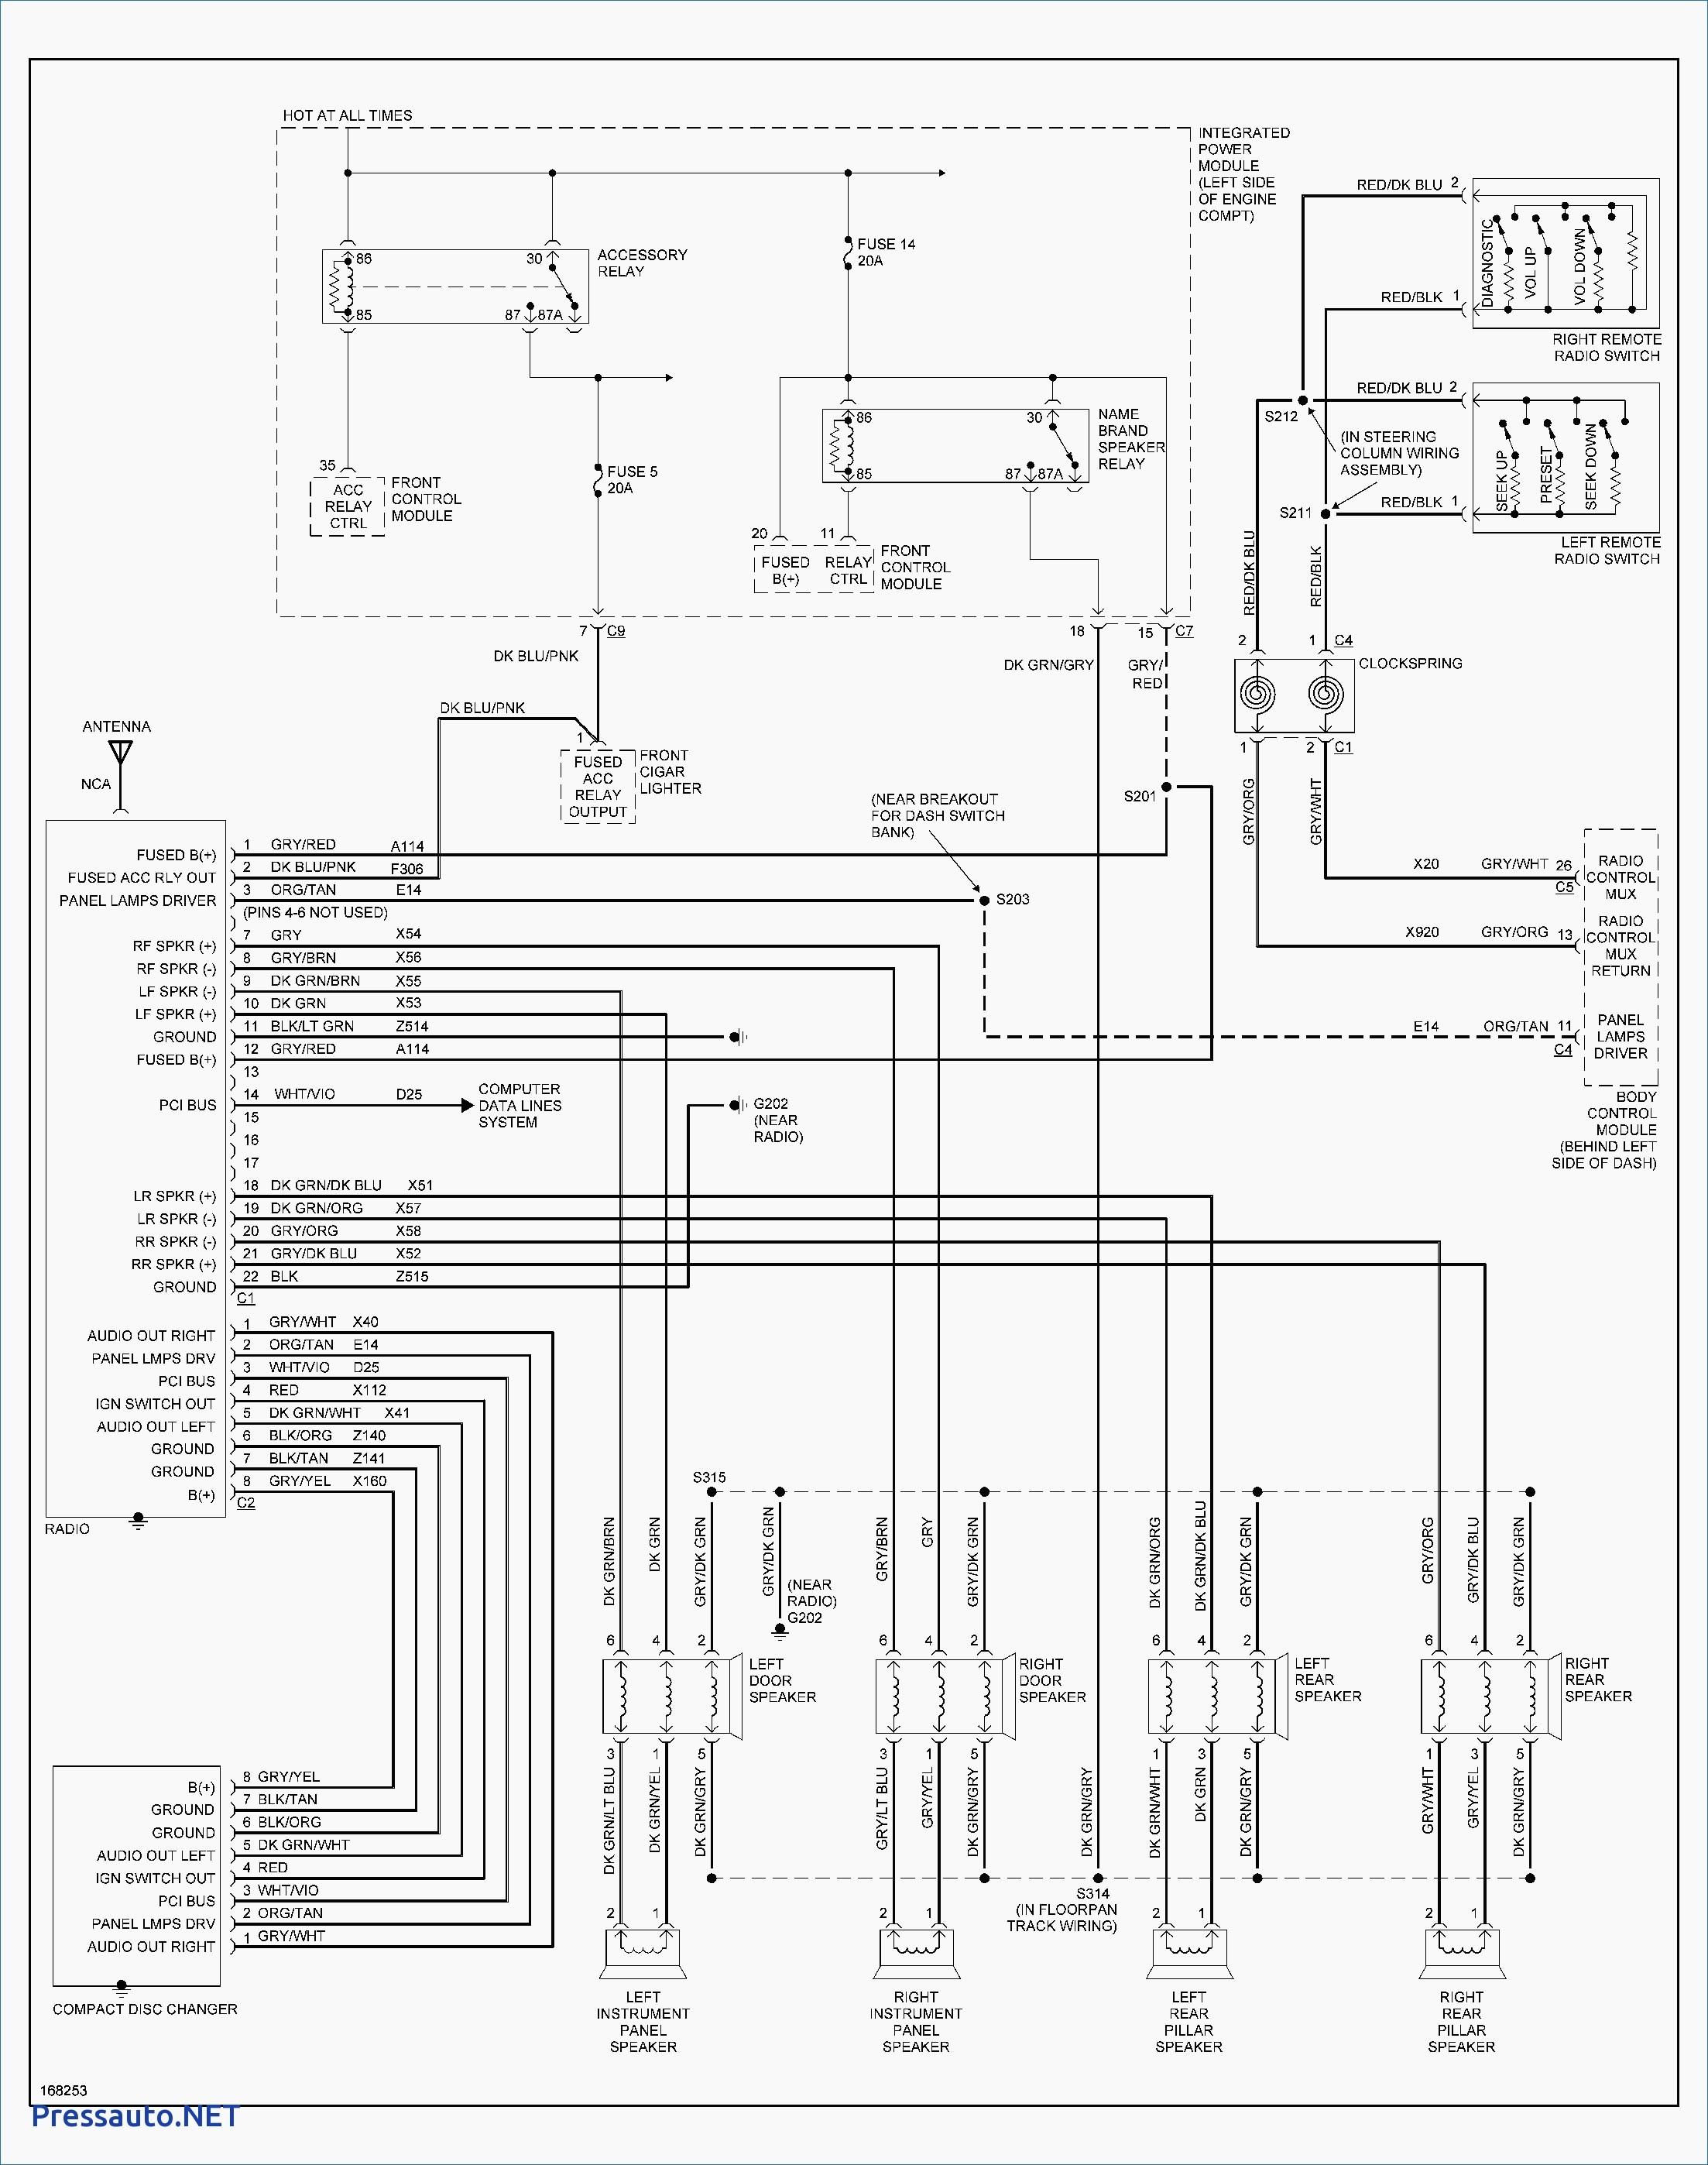 Wiring Diagram Dodge Ram 1500 Inspiration 2002 Dodge Ram 1500 Wiring Diagram Free Pressauto Net Stuning